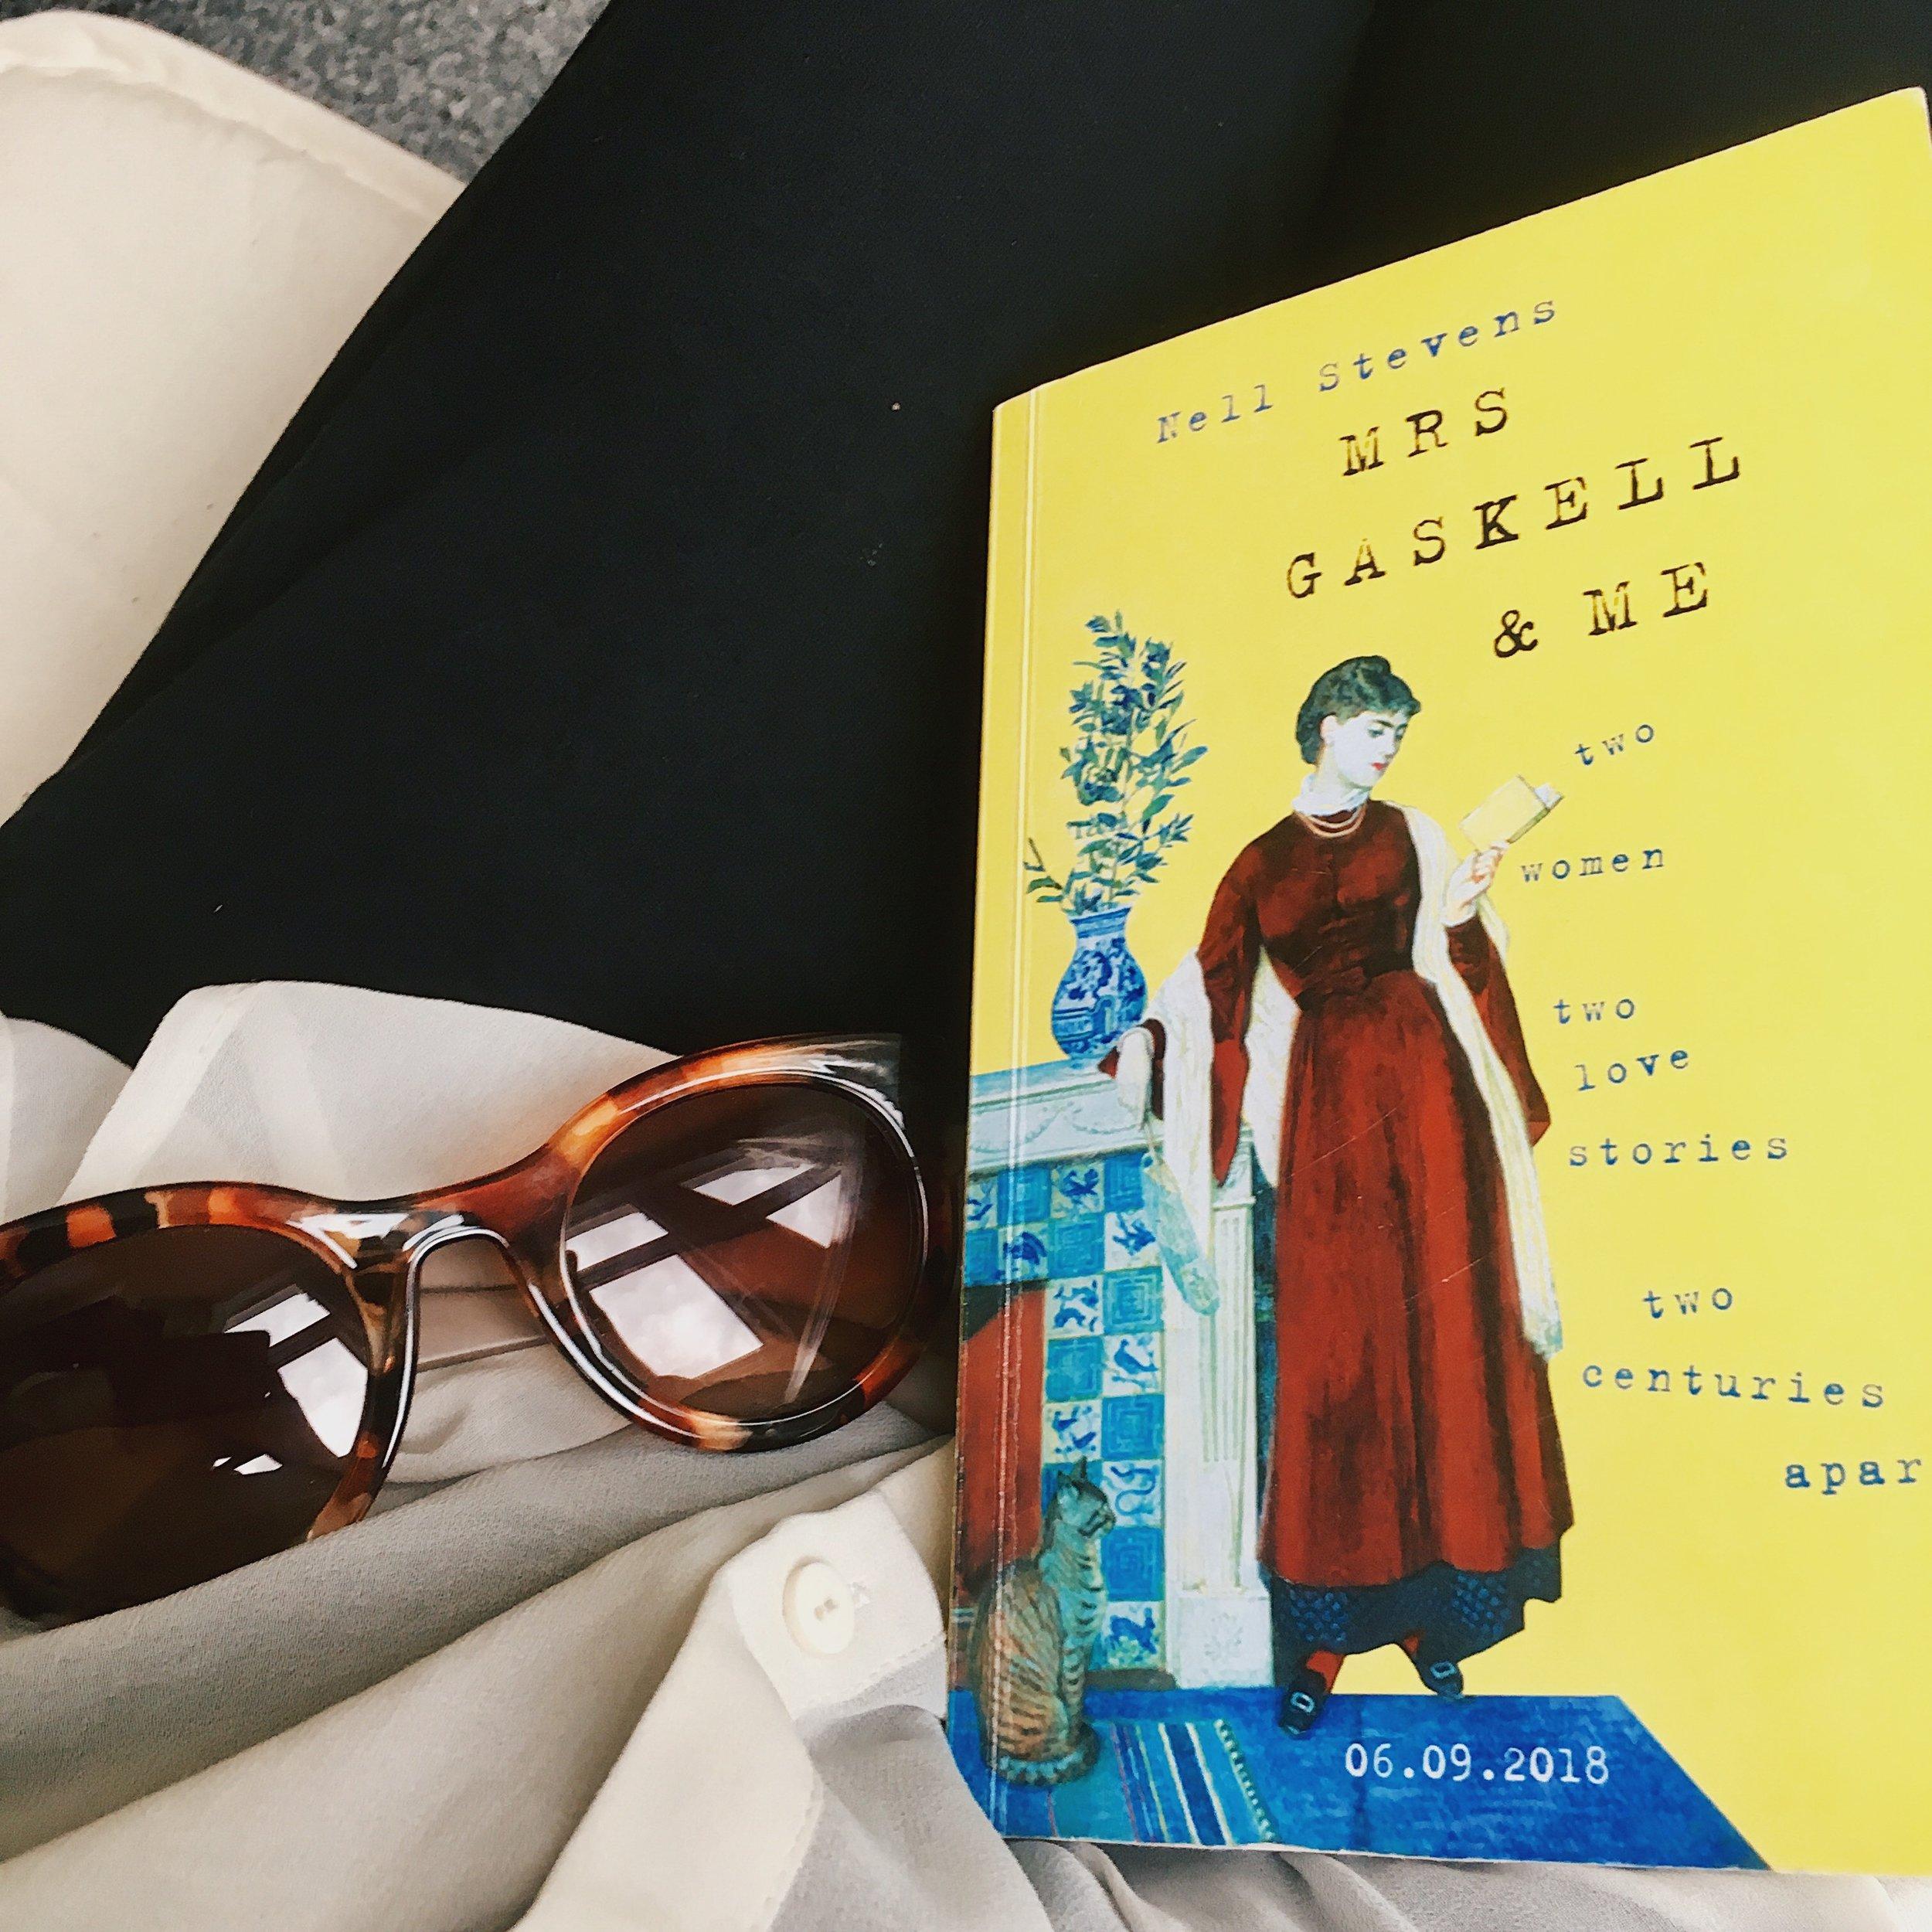 Georgia Andrews Summer Reads 2019 The Attic on Eighth 3.JPG